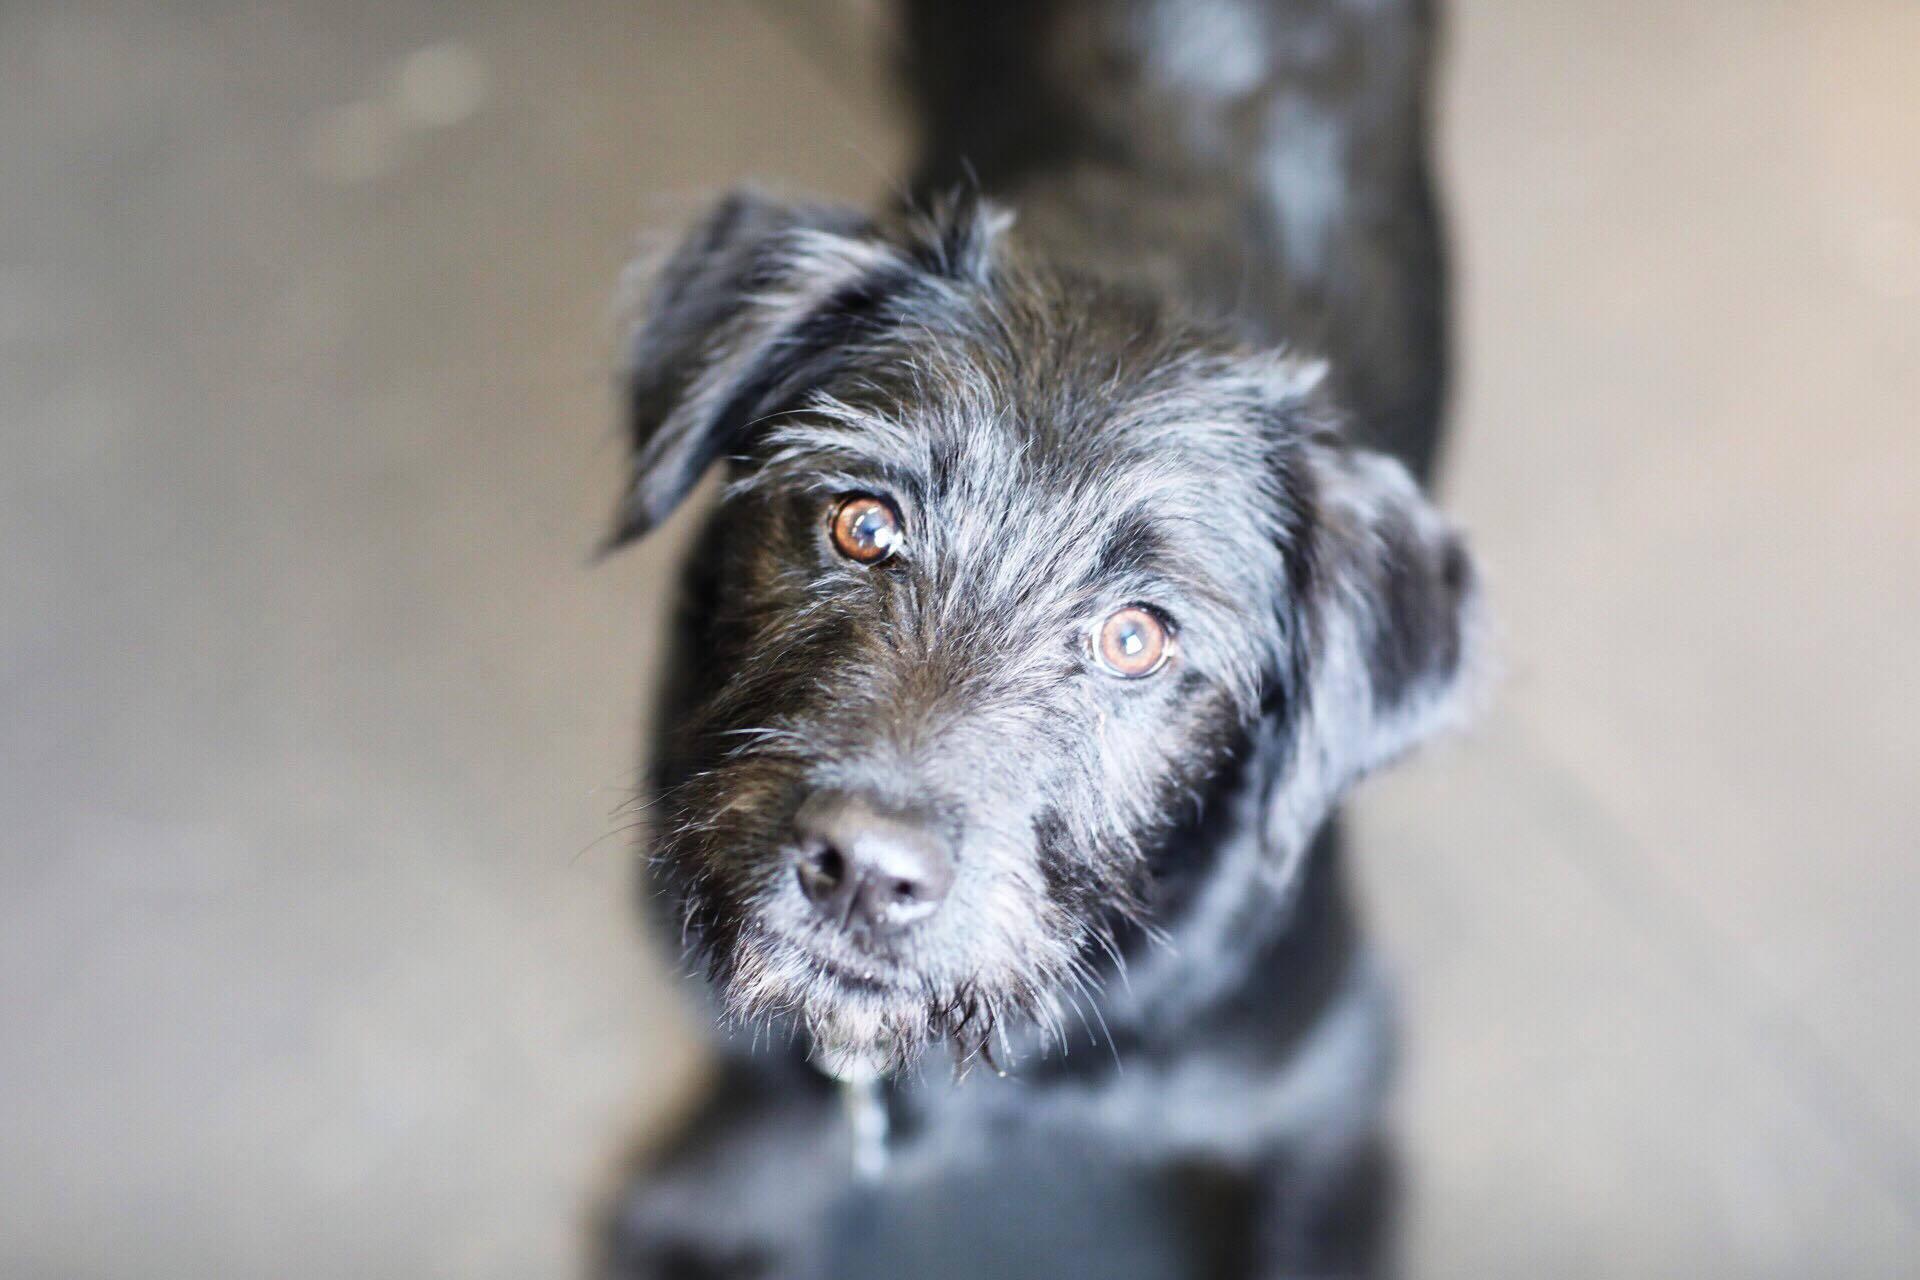 pets for adoption at helping paws, in gorham, me | petfinder